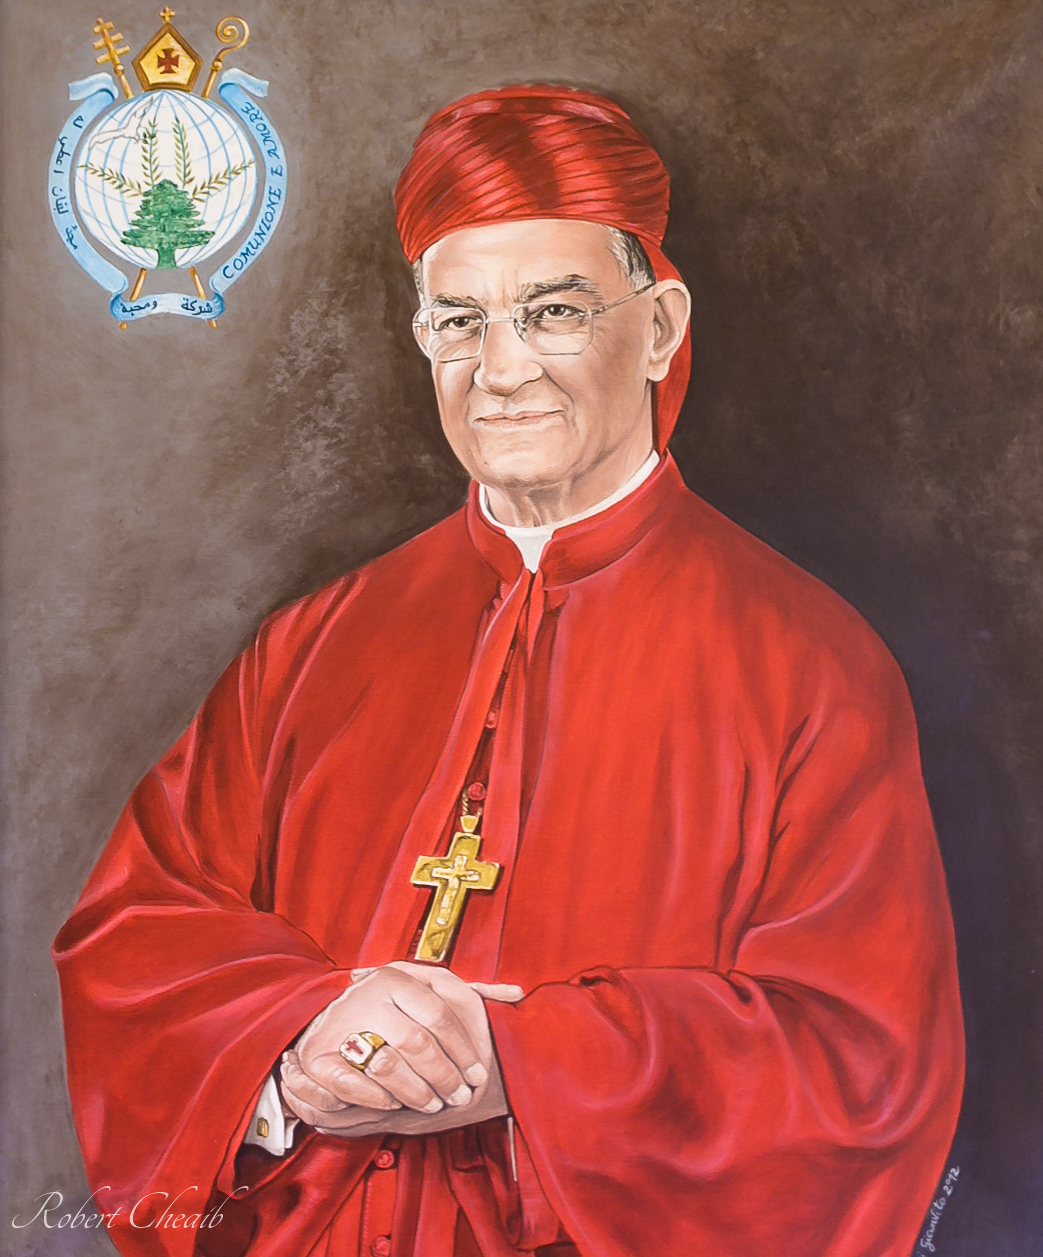 Maronite Patriarch Bechara Rai